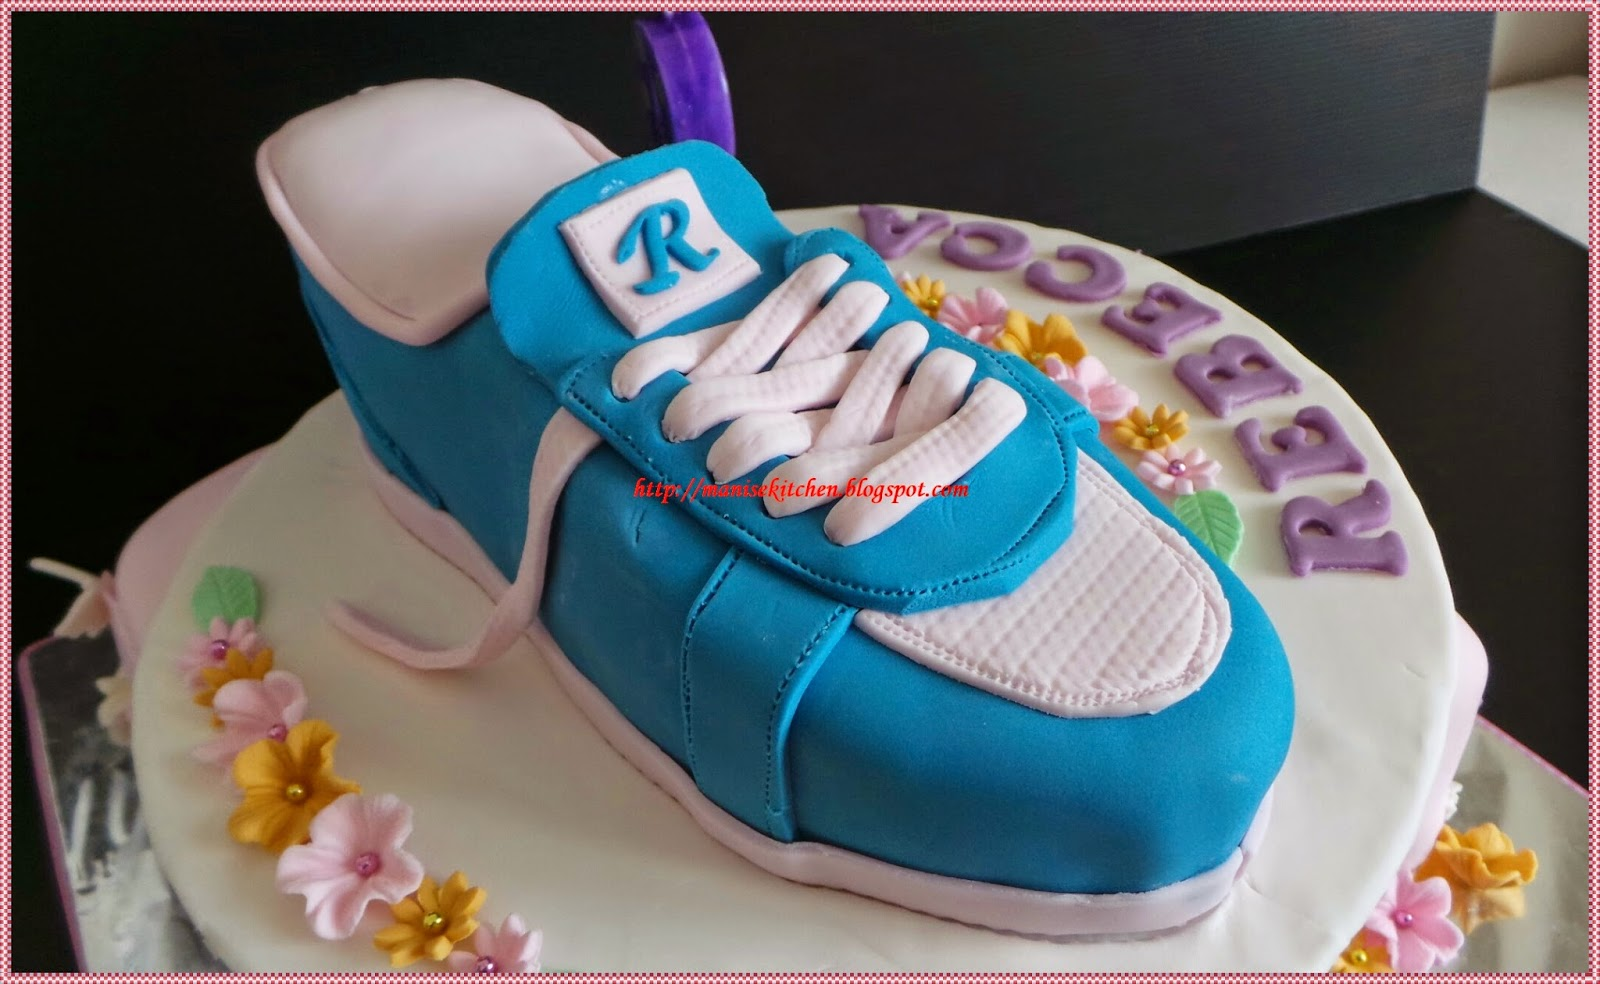 manise kitchen: Shoe Cake for Rebecca Carsonia Berhitoe